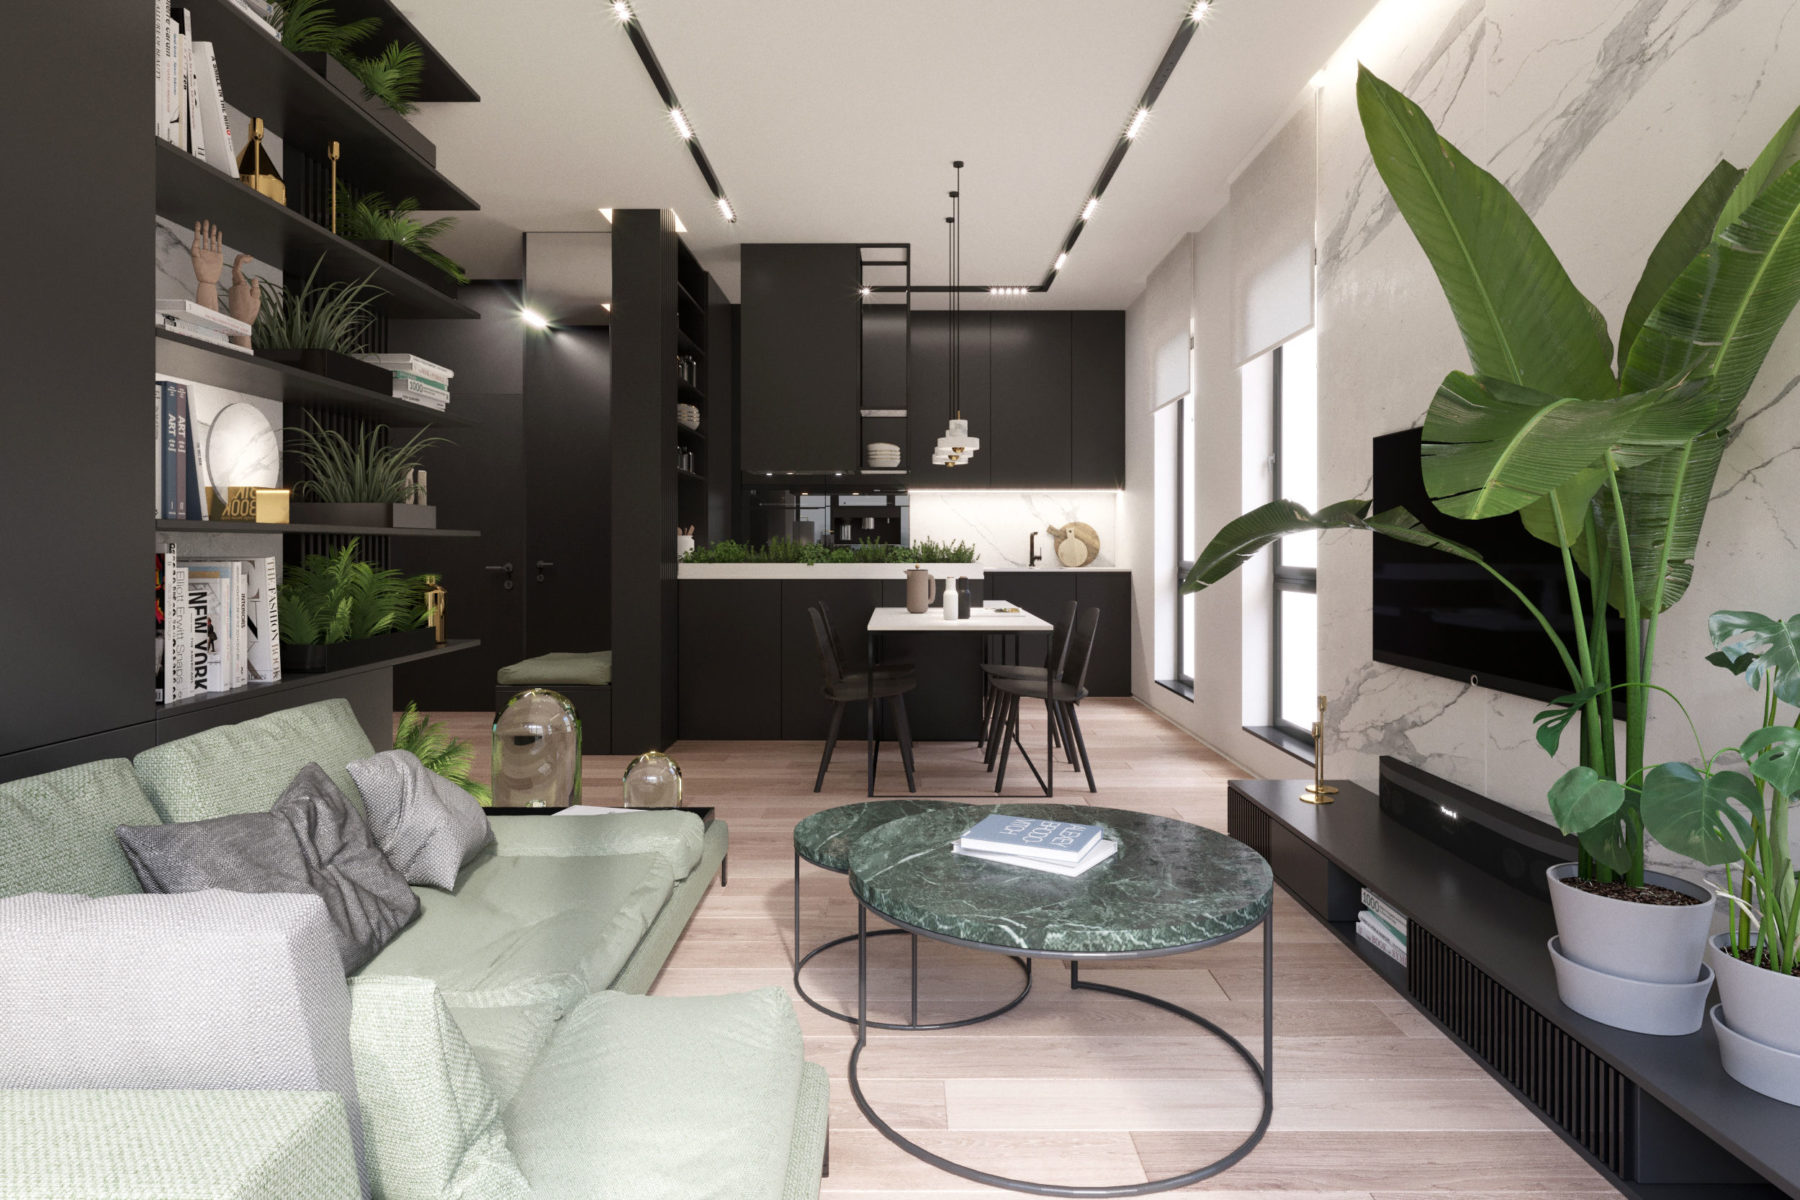 Apartament w garniturze